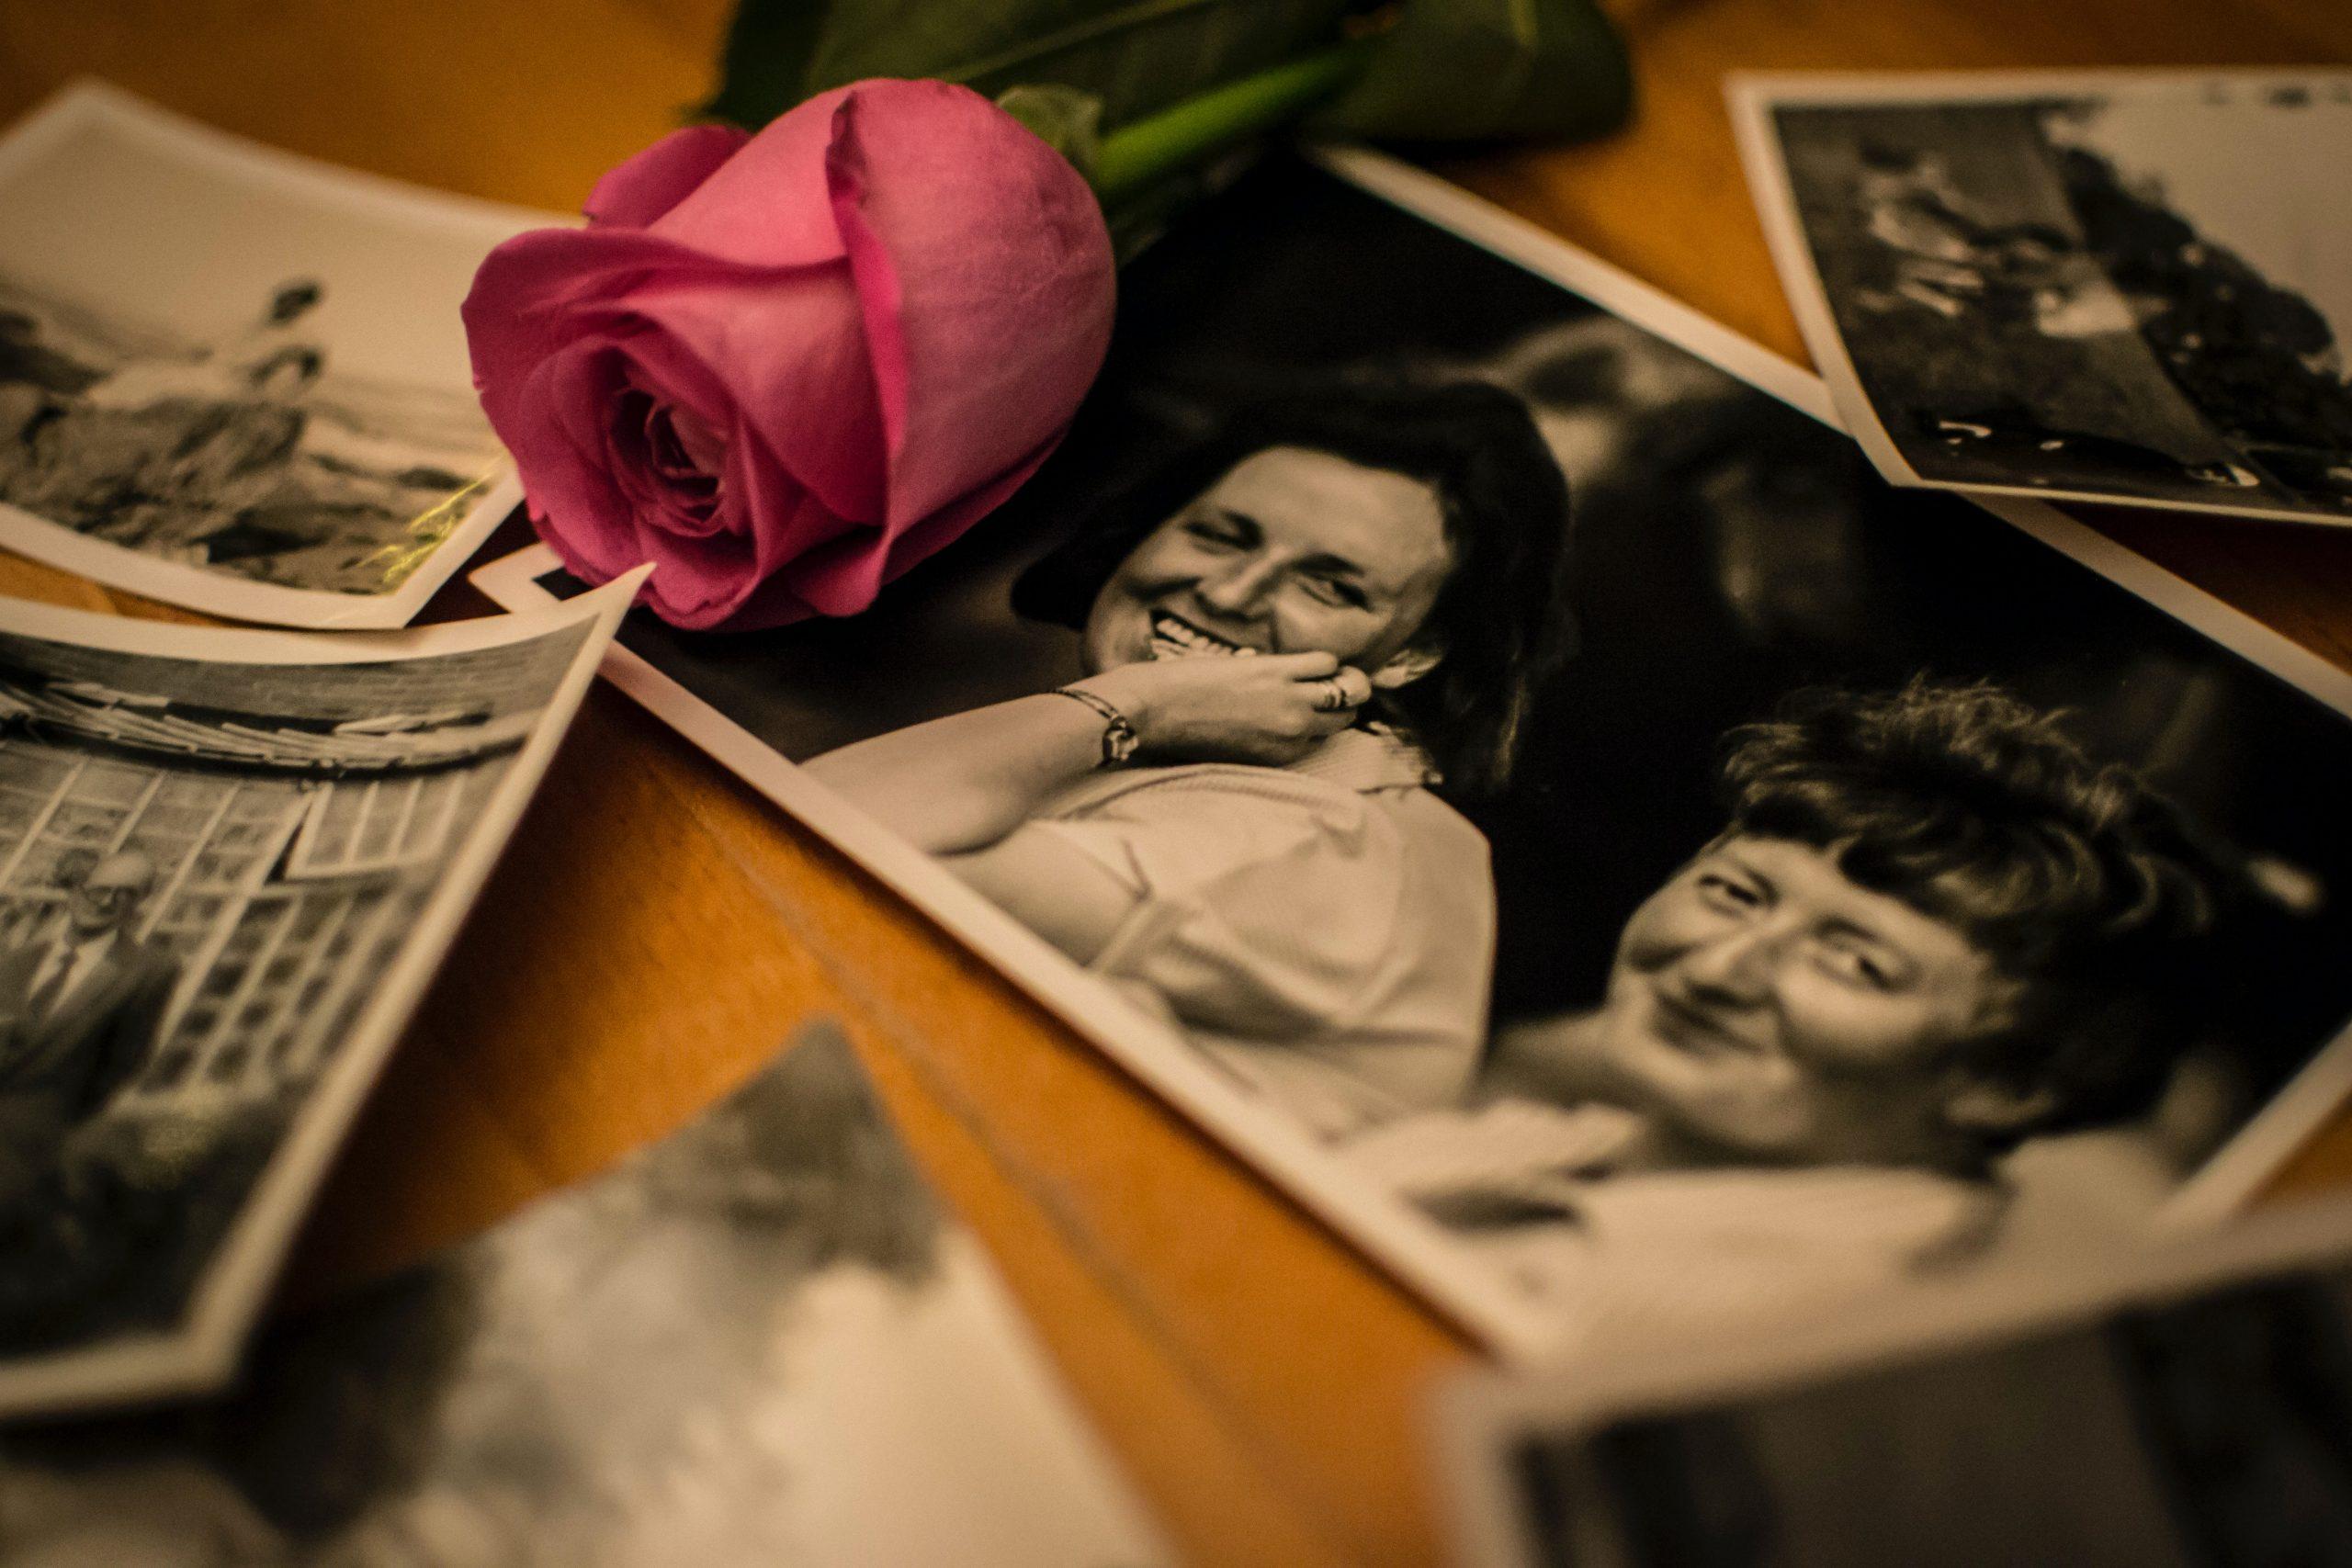 photos of memories